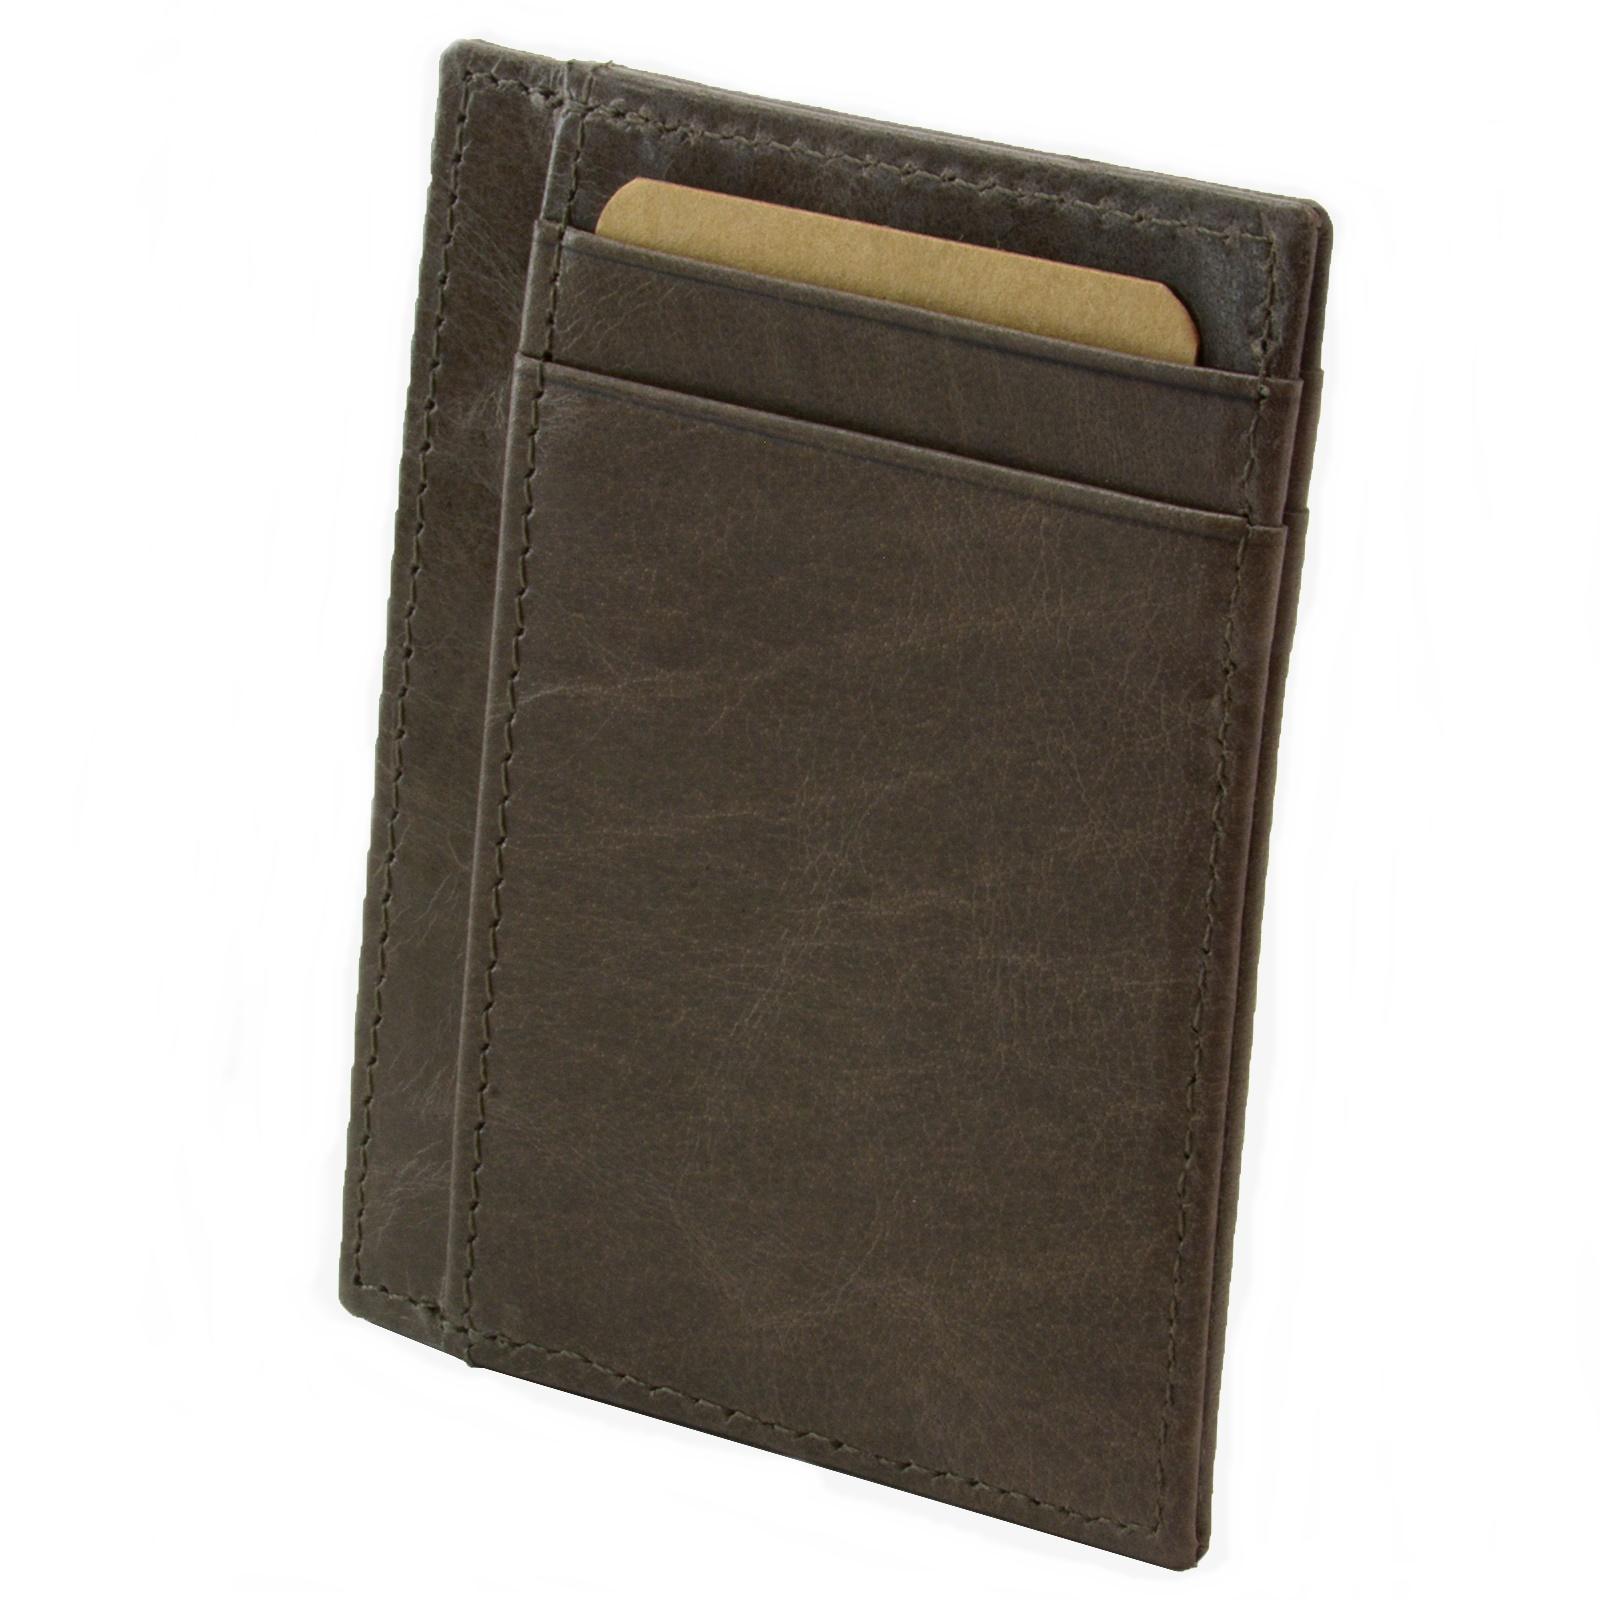 miniature 57 - Hammer-Anvil-Minimalist-Front-Pocket-Wallet-RFID-Blocking-Thin-Leather-Card-Case